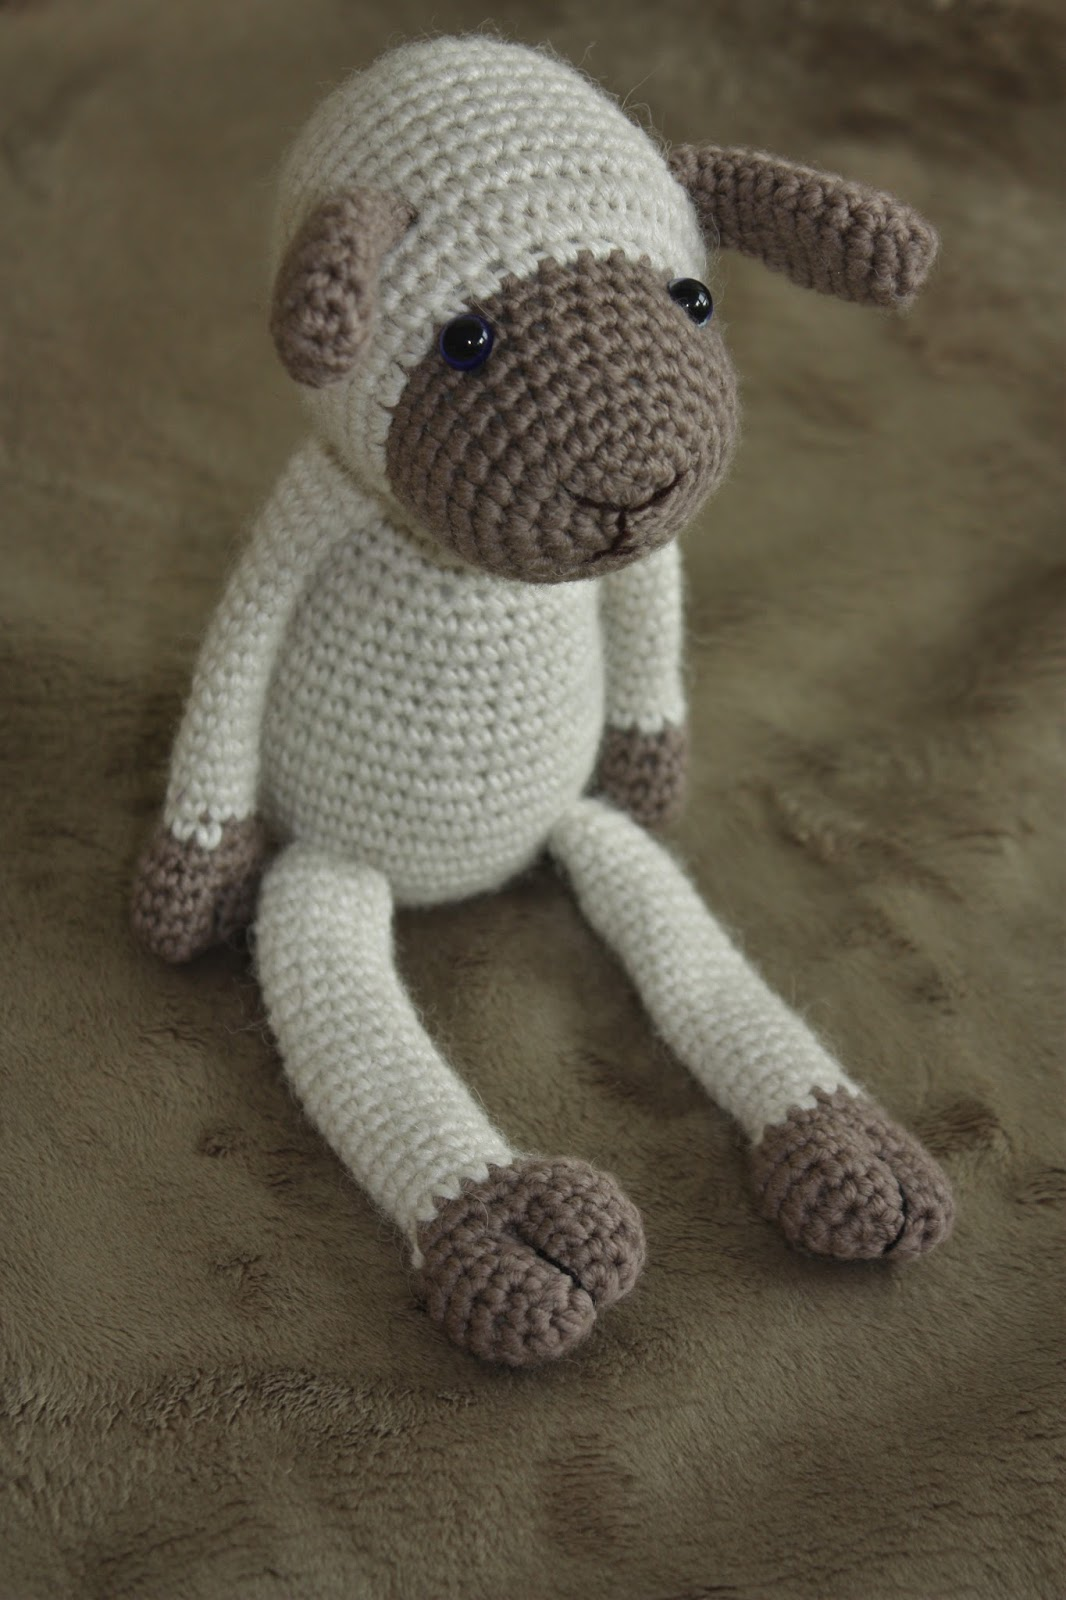 Amigurumi Lamb Patterns : Happyamigurumi: New Amigurumi Sheep Pattern